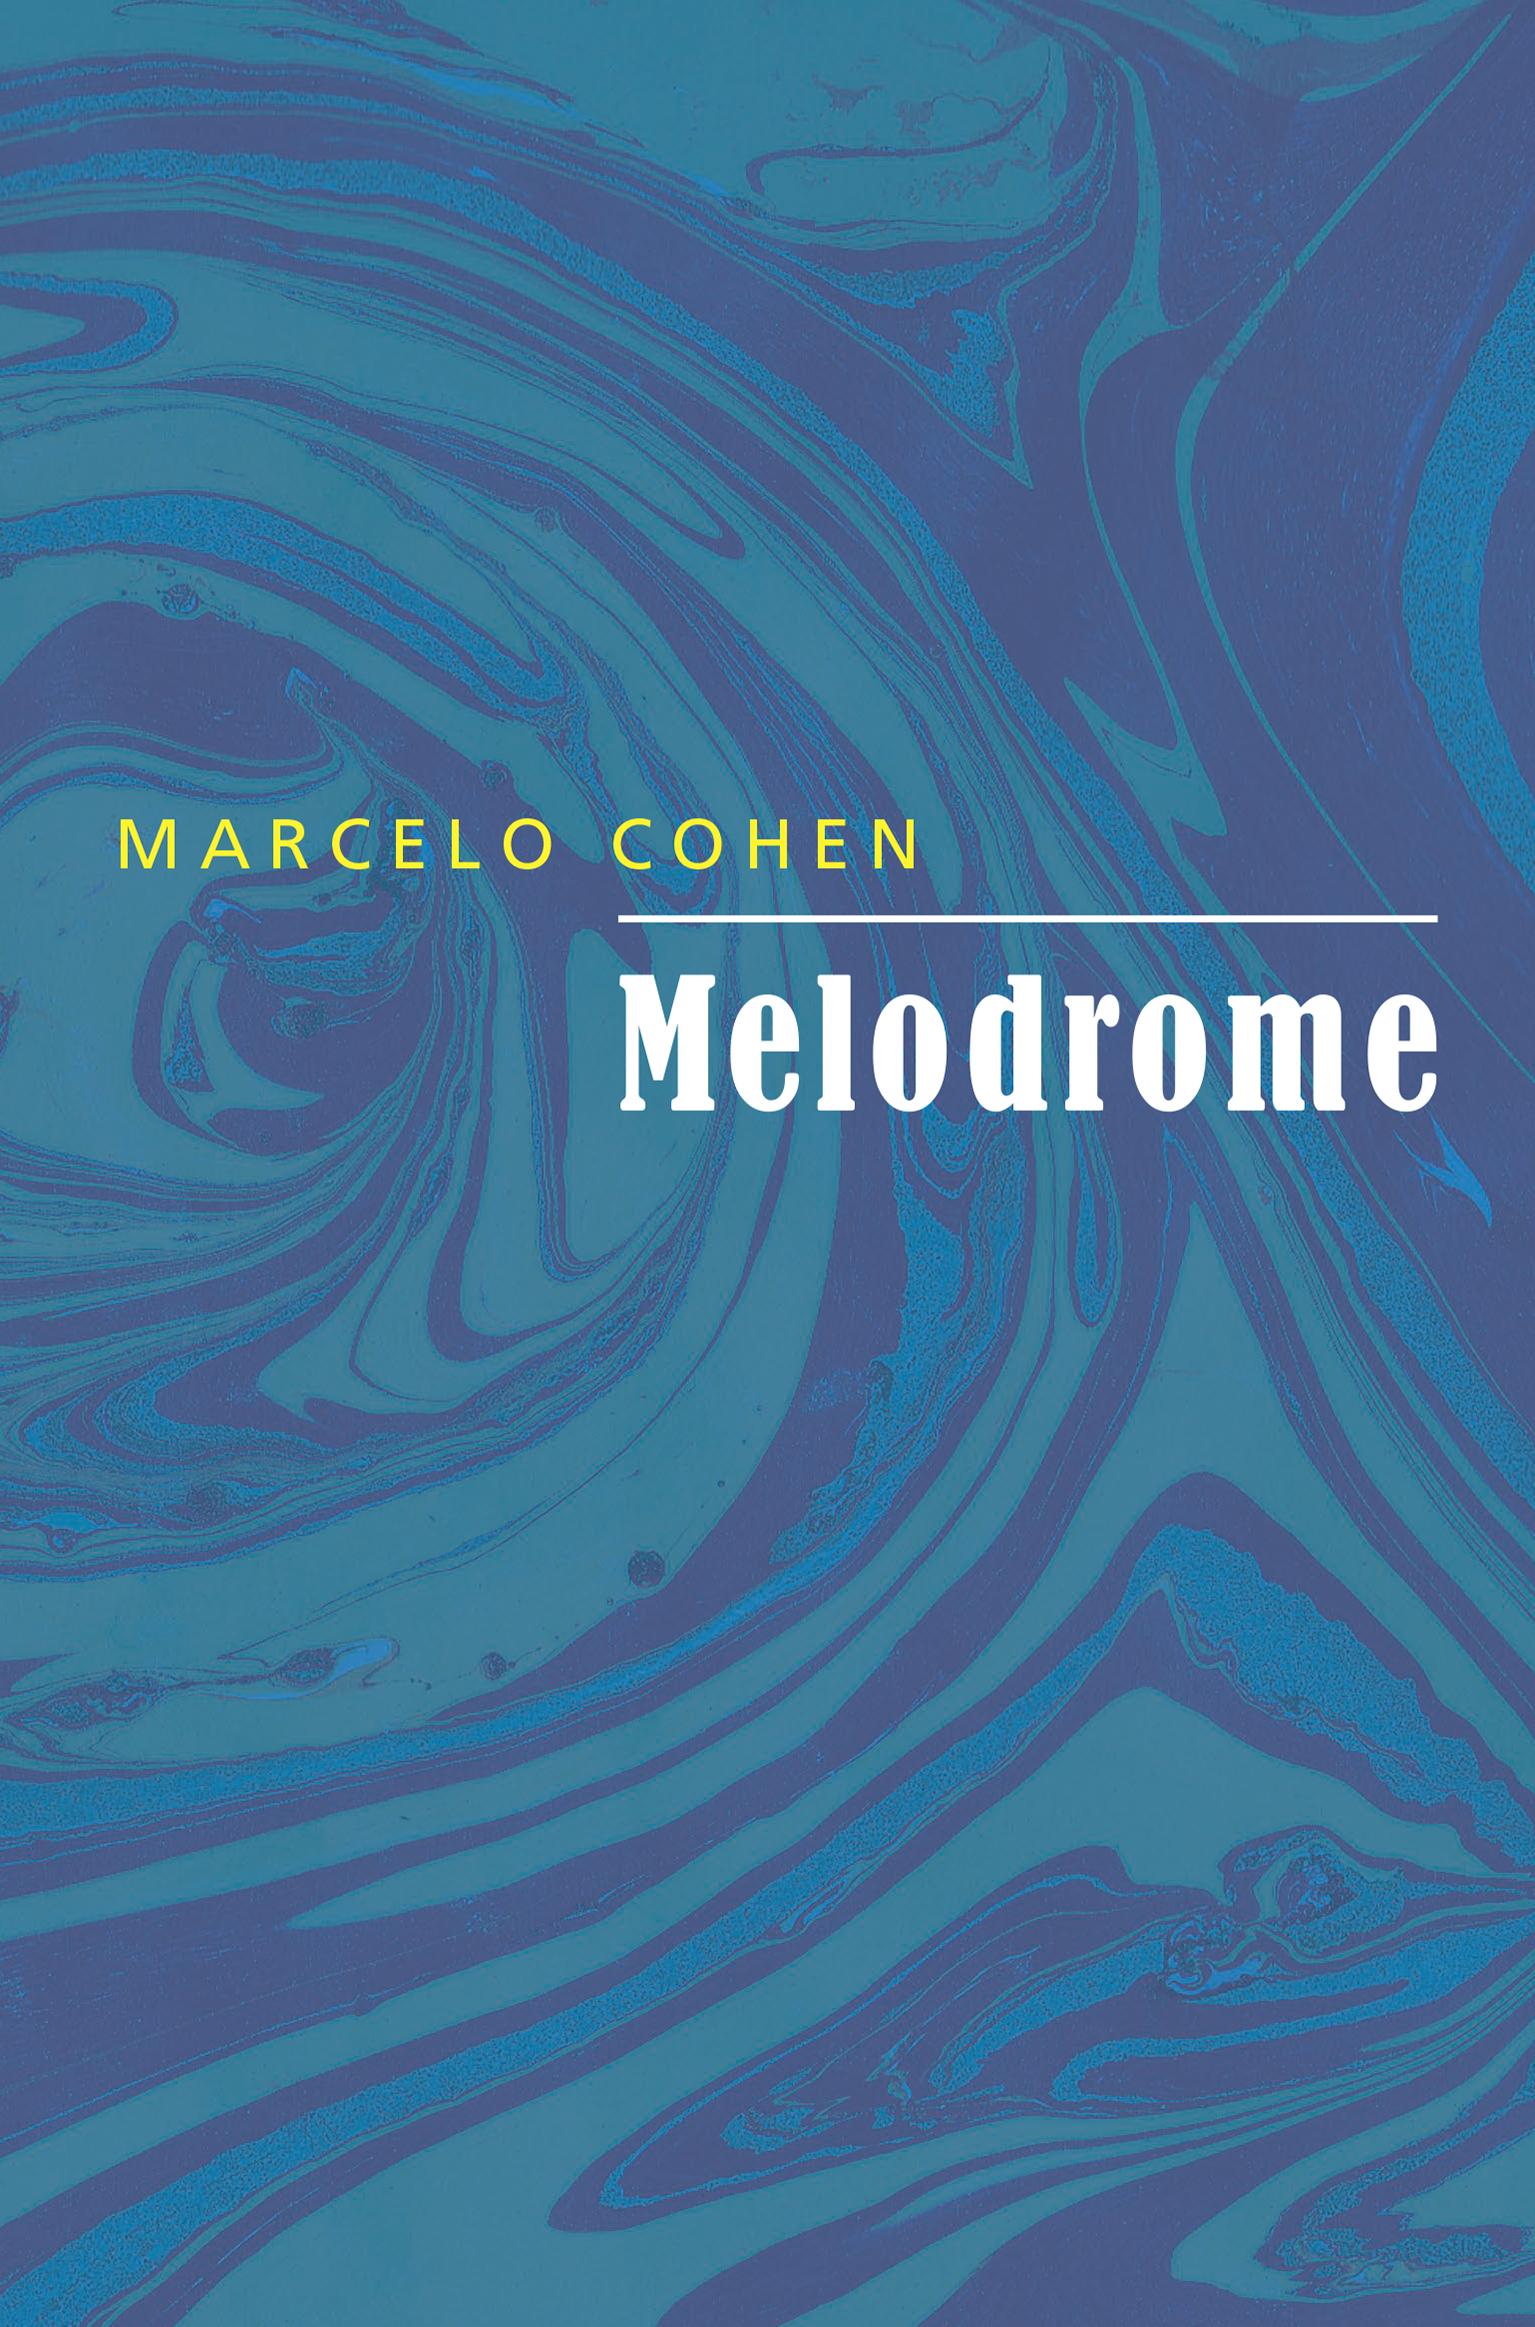 Melodrome